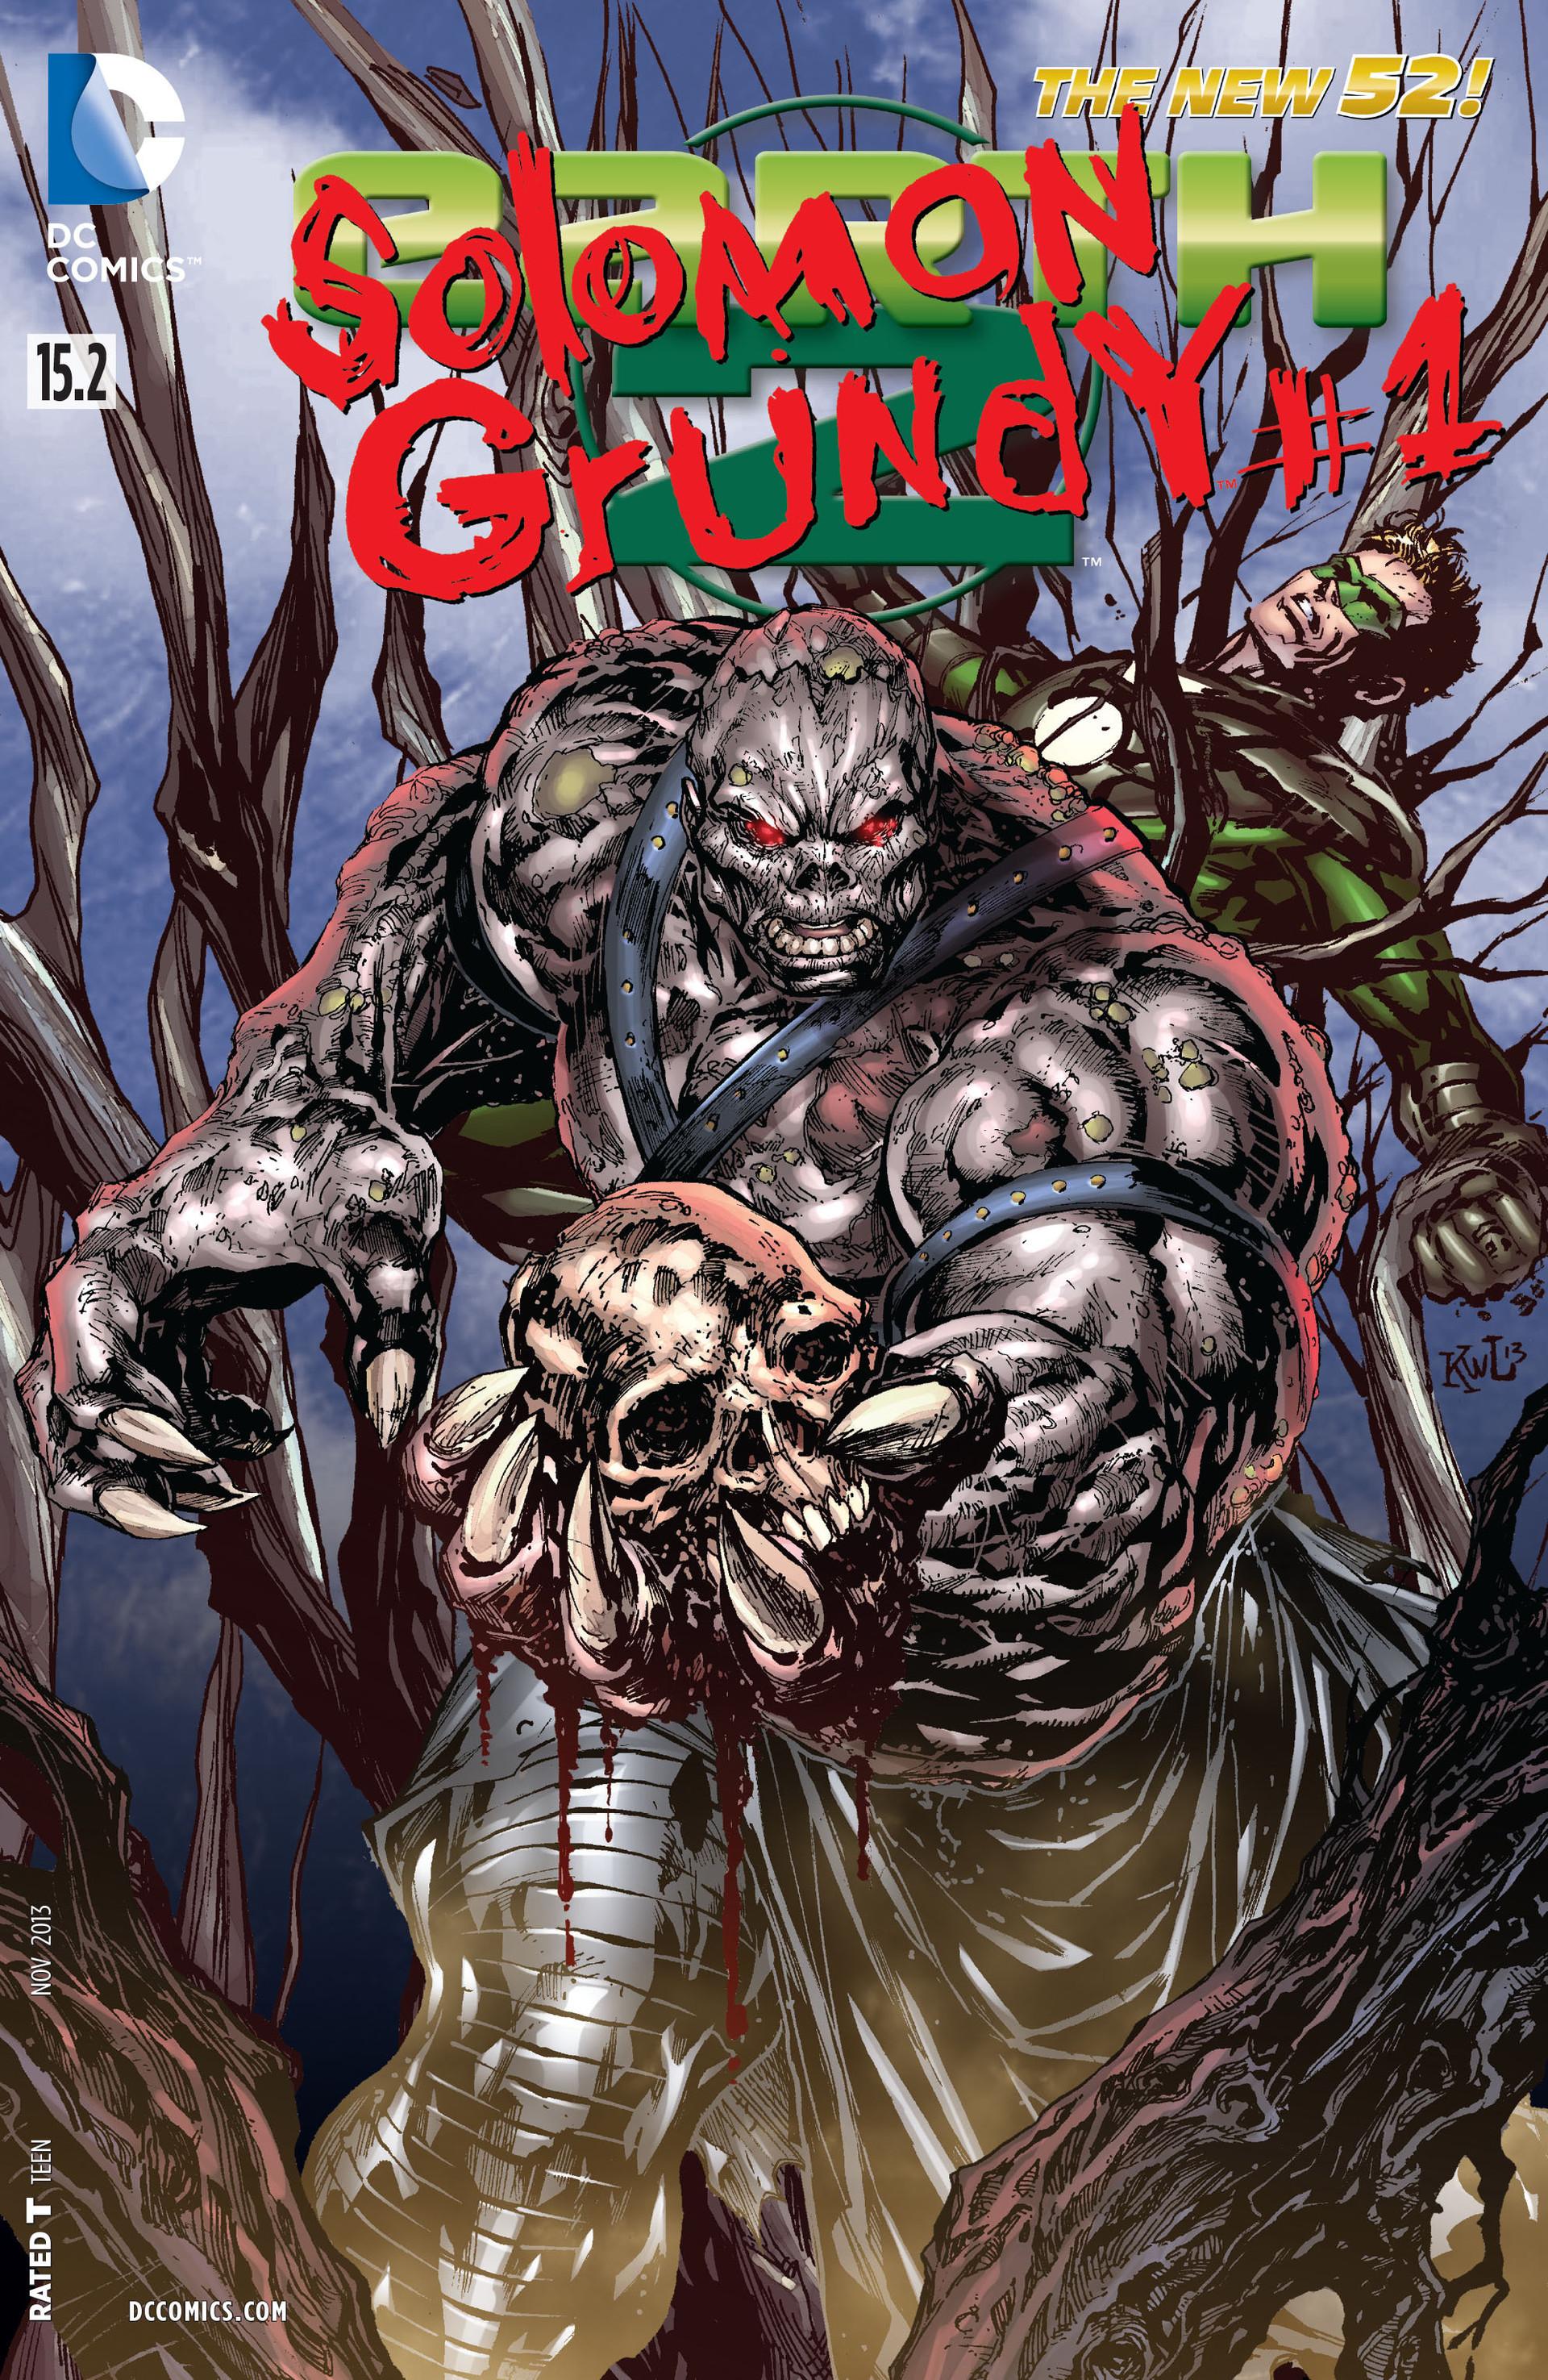 Earth 2 Vol 1 15.2: Solomon Grundy